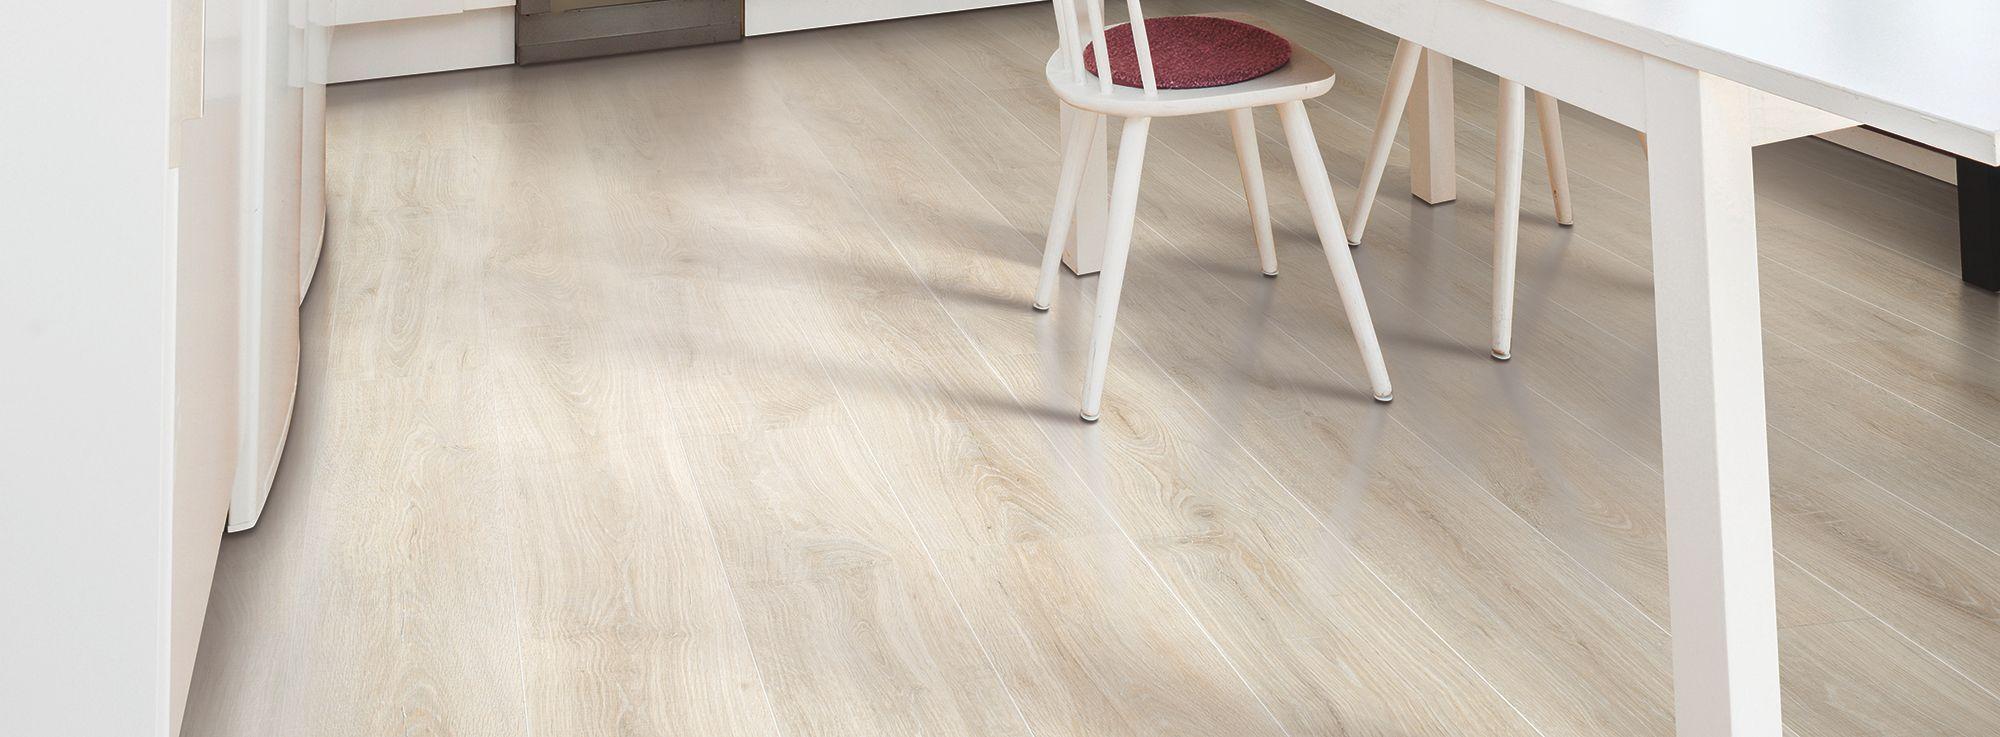 Rustic legacy sandcastle oak mohawk laminate flooring for Mohawk laminate flooring